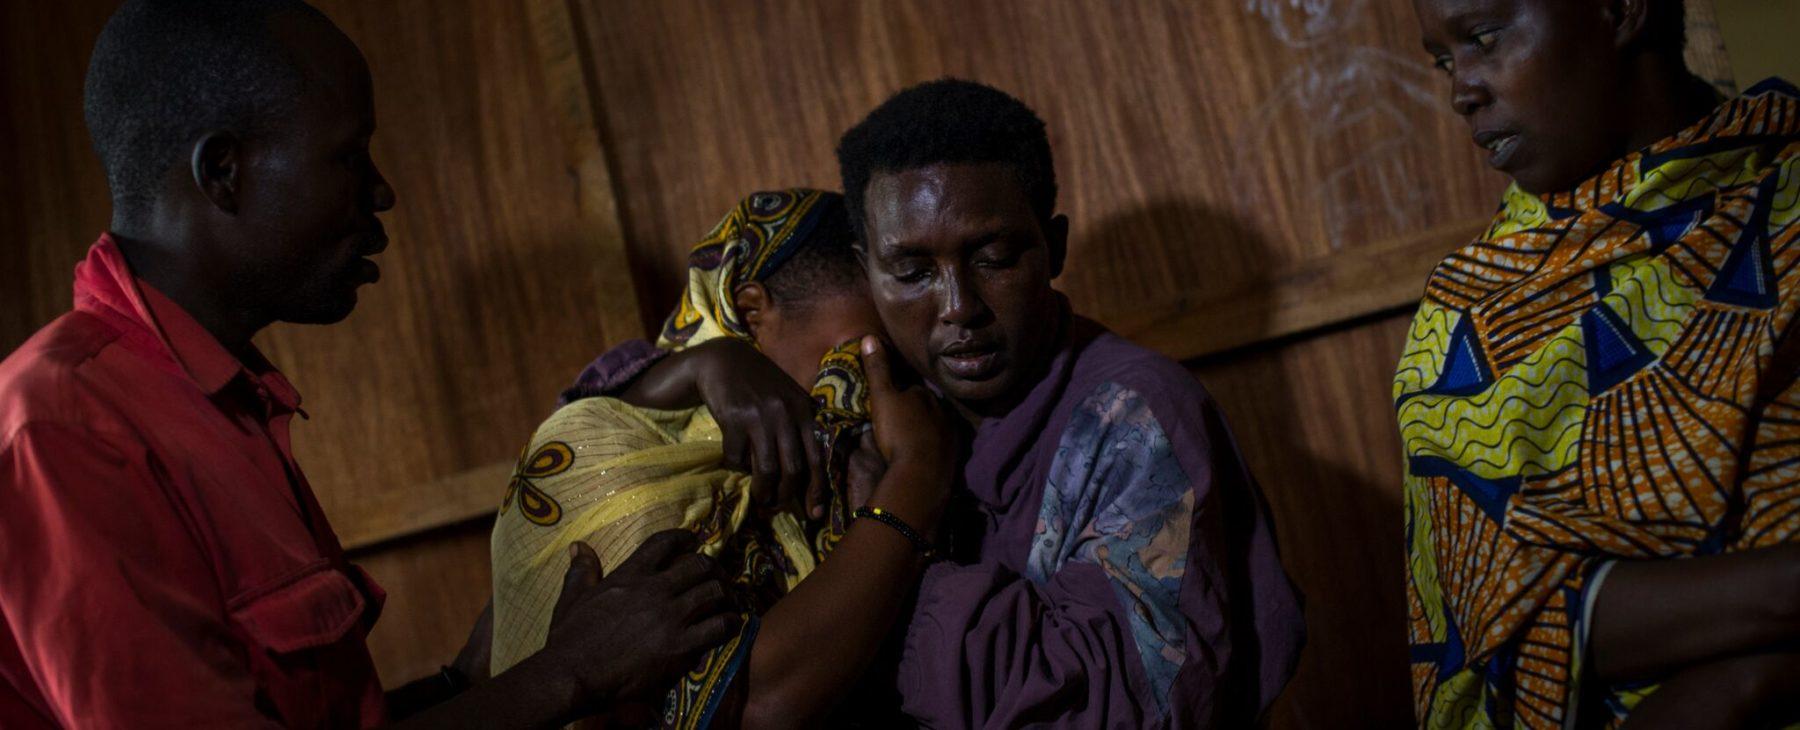 Burundi: enforced disappearances